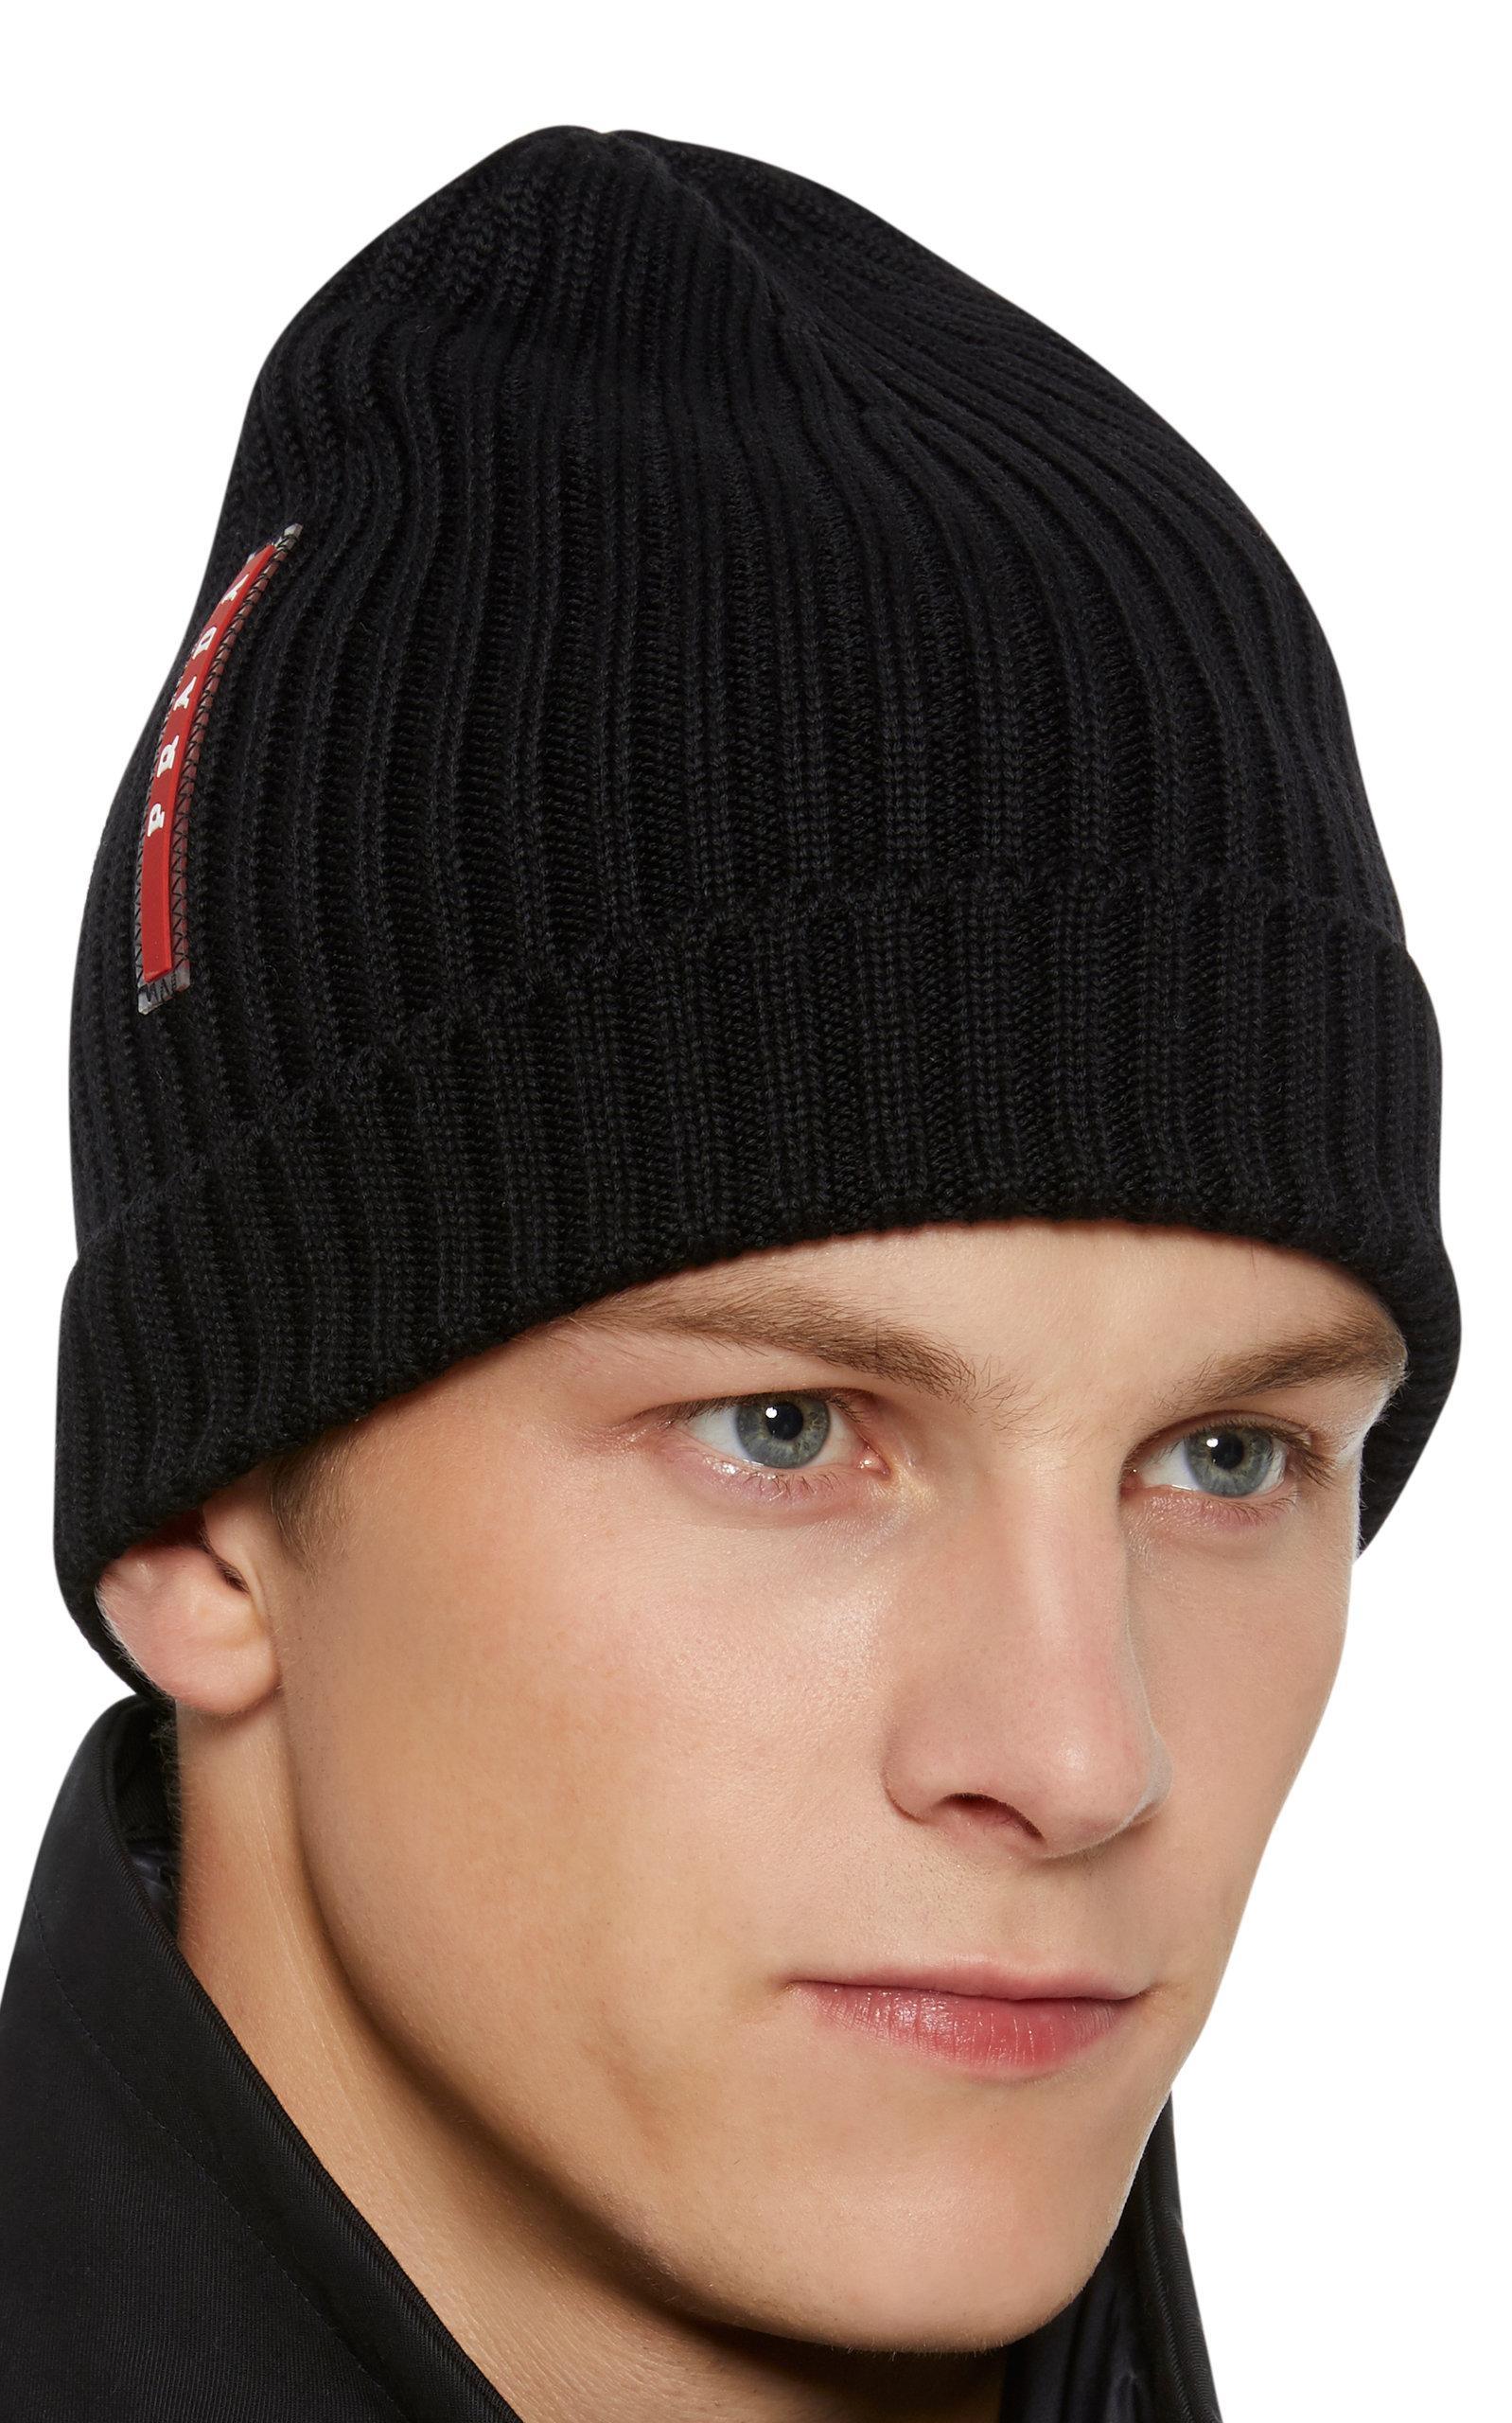 Lyst - Prada Logo-appliquéd Ribbed Wool Beanie in Black for Men ... 1bd8d9827d2f